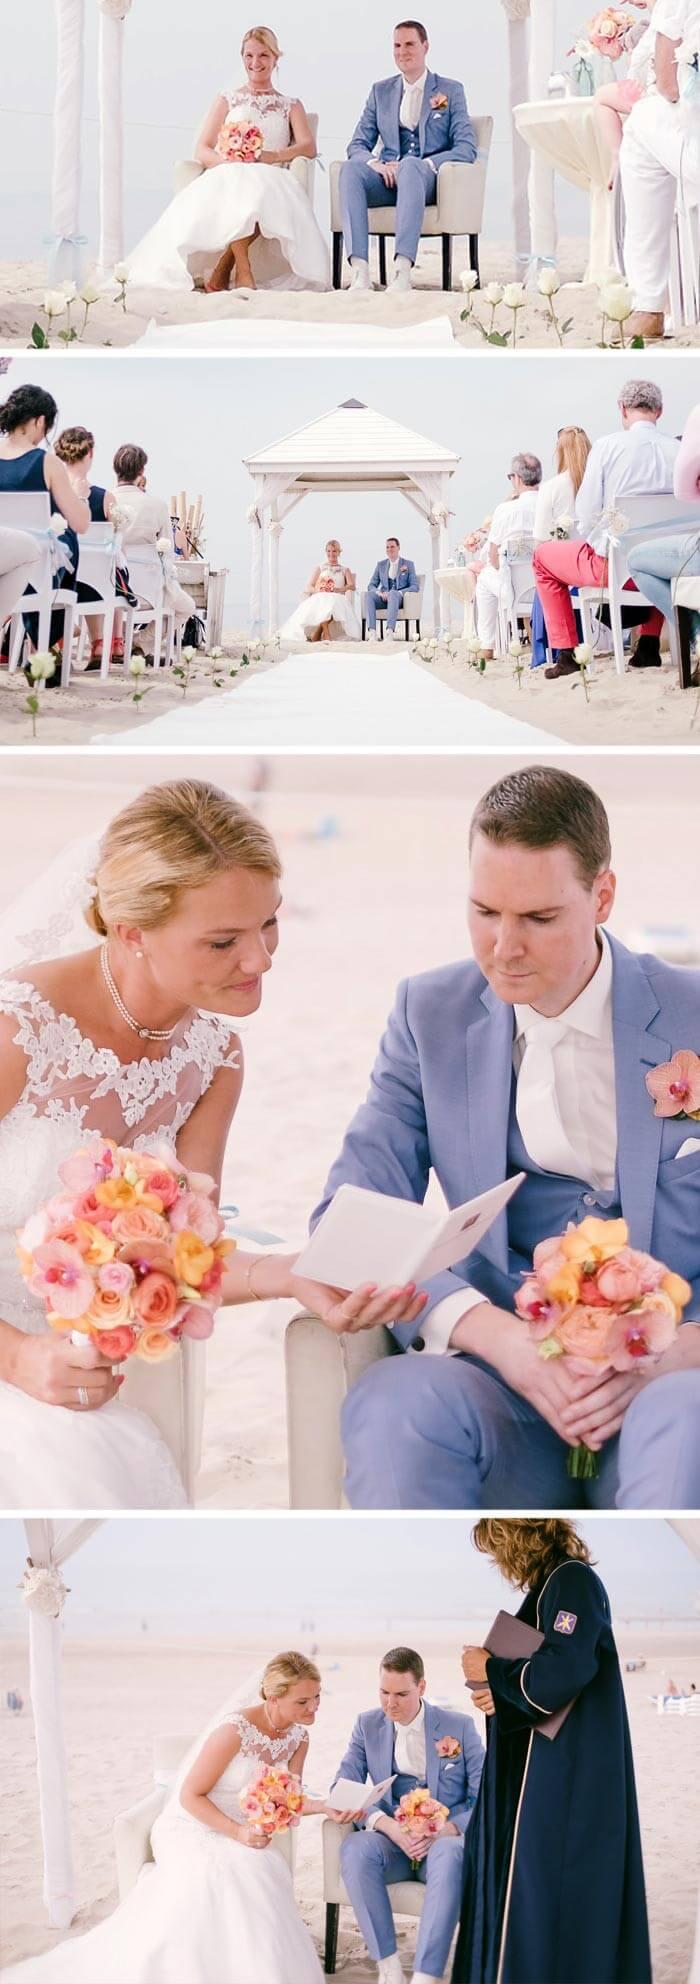 Heiraten in Holland am Strand